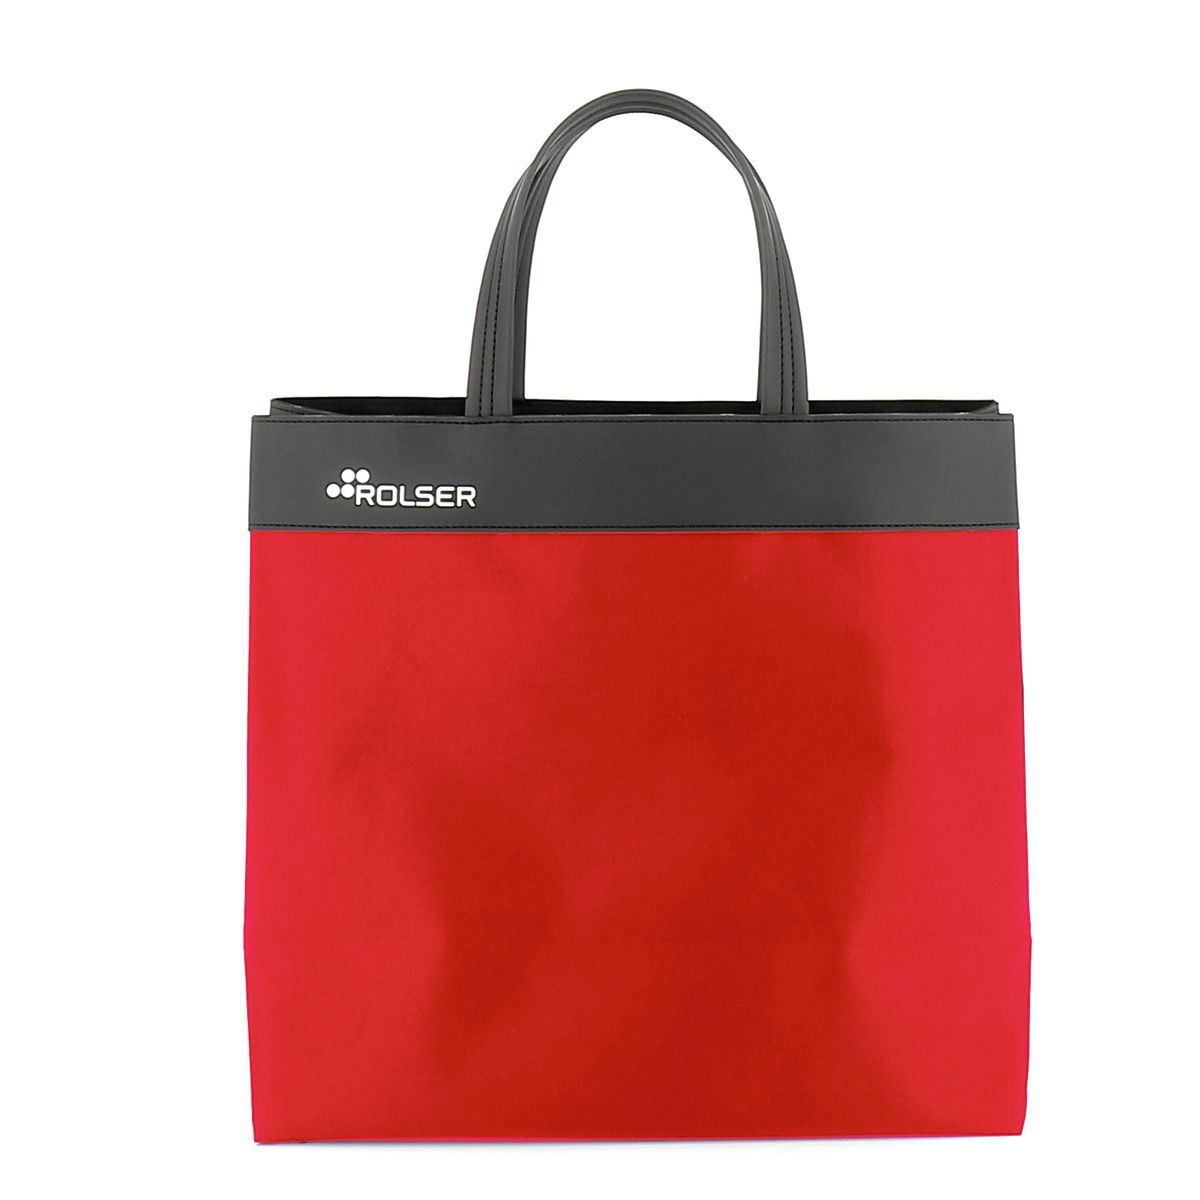 Sac de course en polyester rouge 33cmx14cmx38cm - Rolser